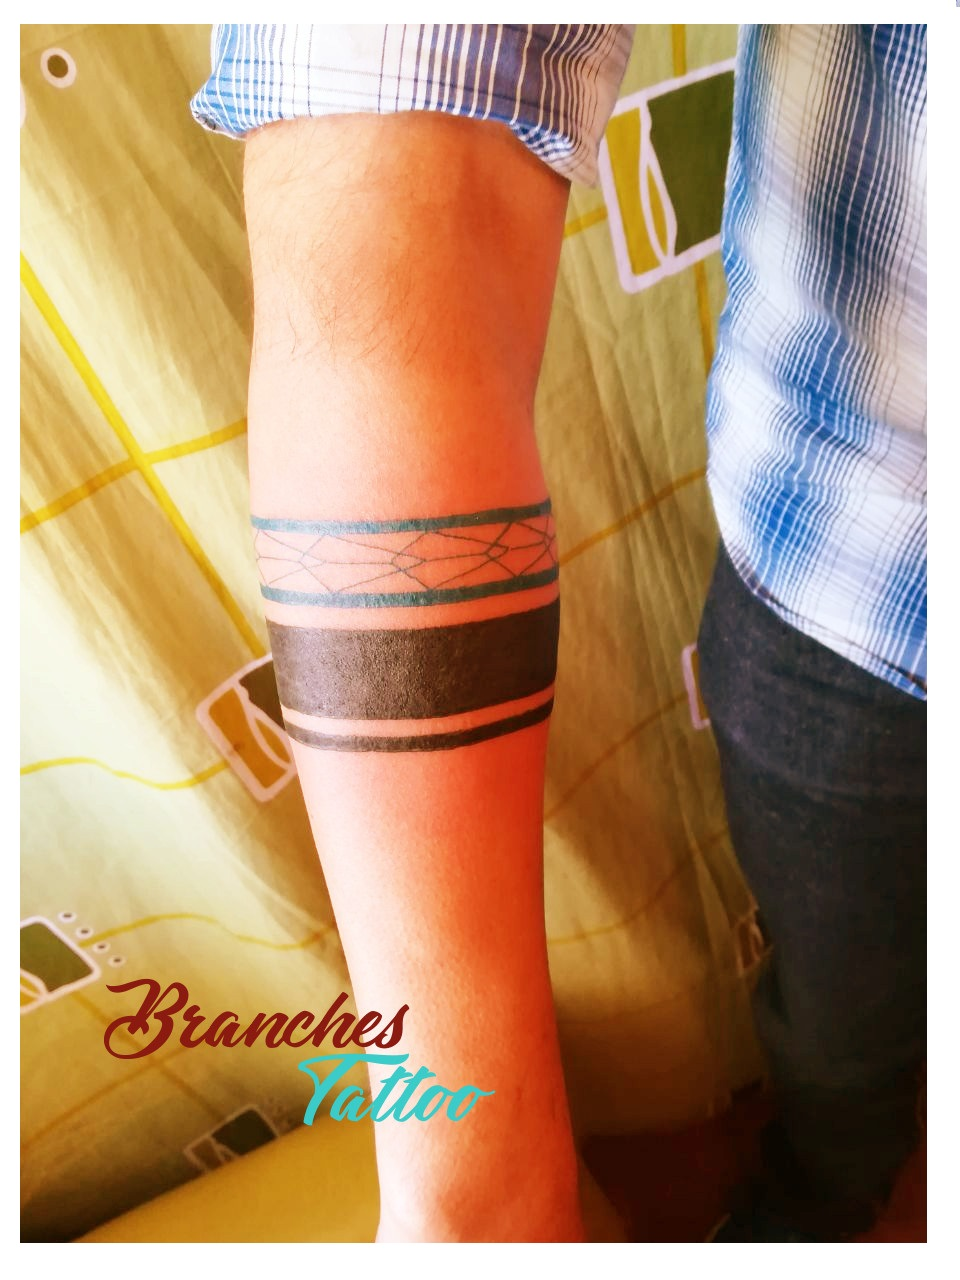 Branches Tattoo Tatuajes De Lineas Minimalistas